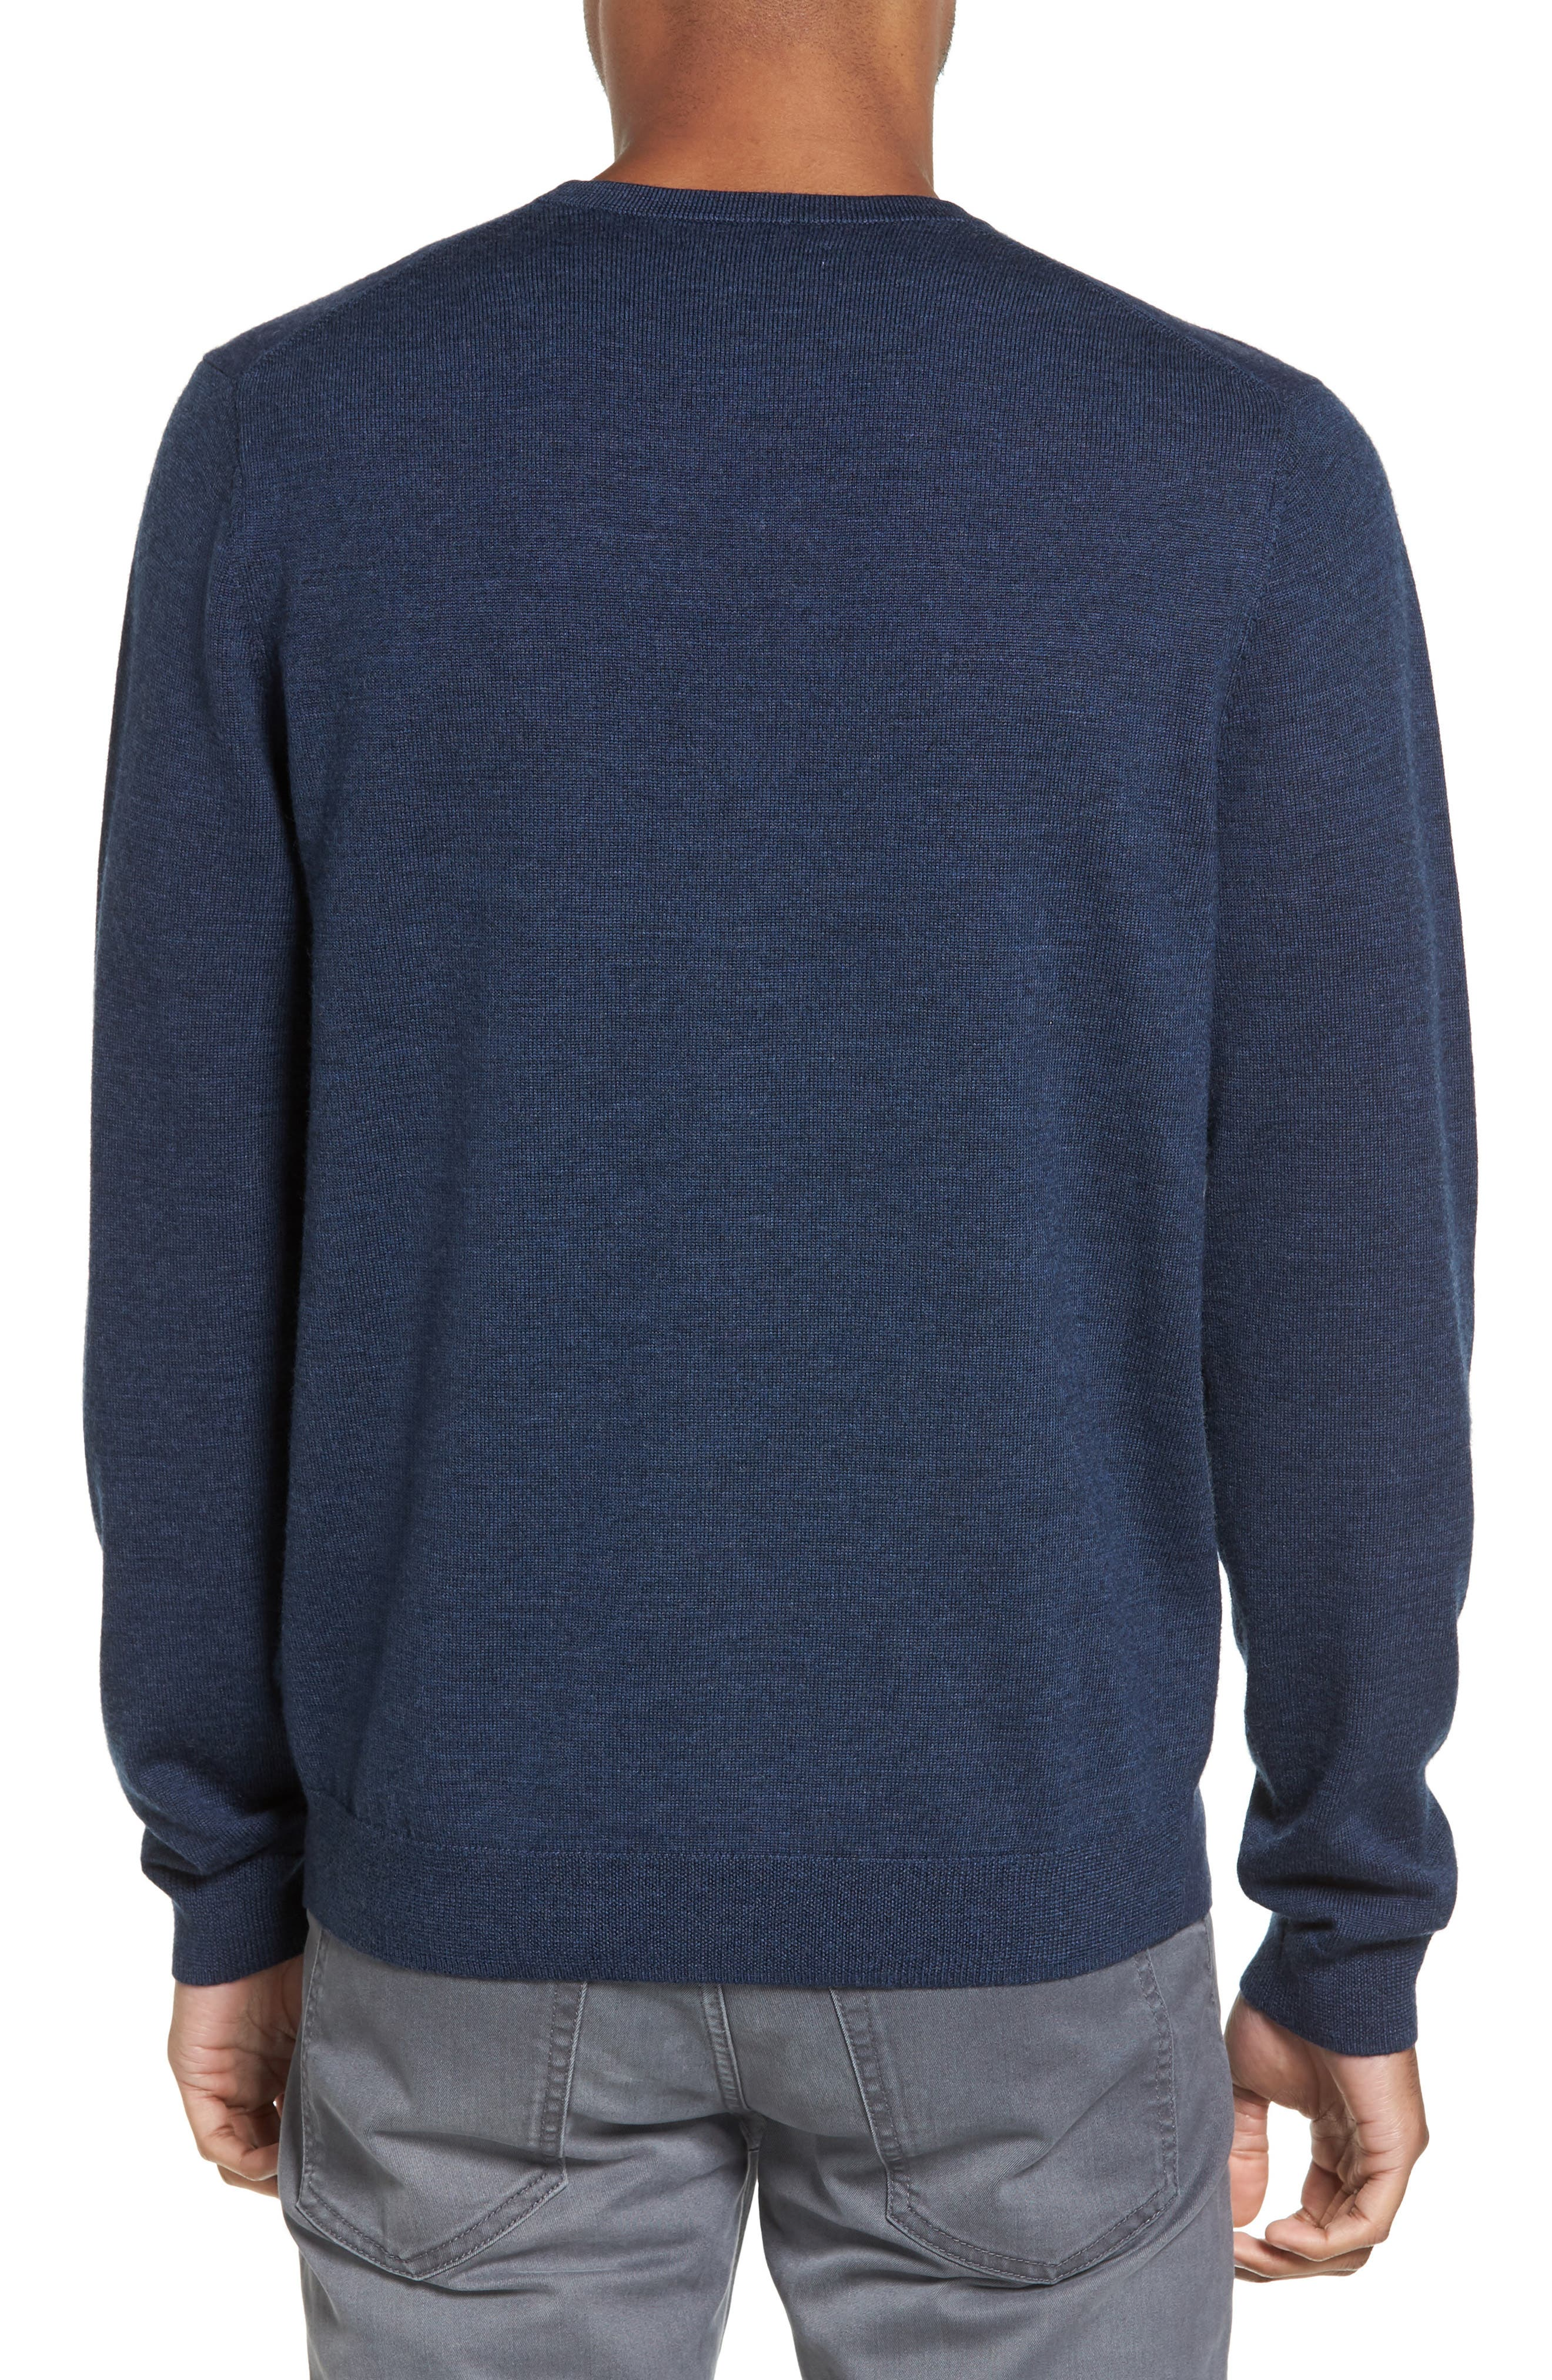 Merino Wool Blend Sweater,                             Alternate thumbnail 2, color,                             Navy Iris